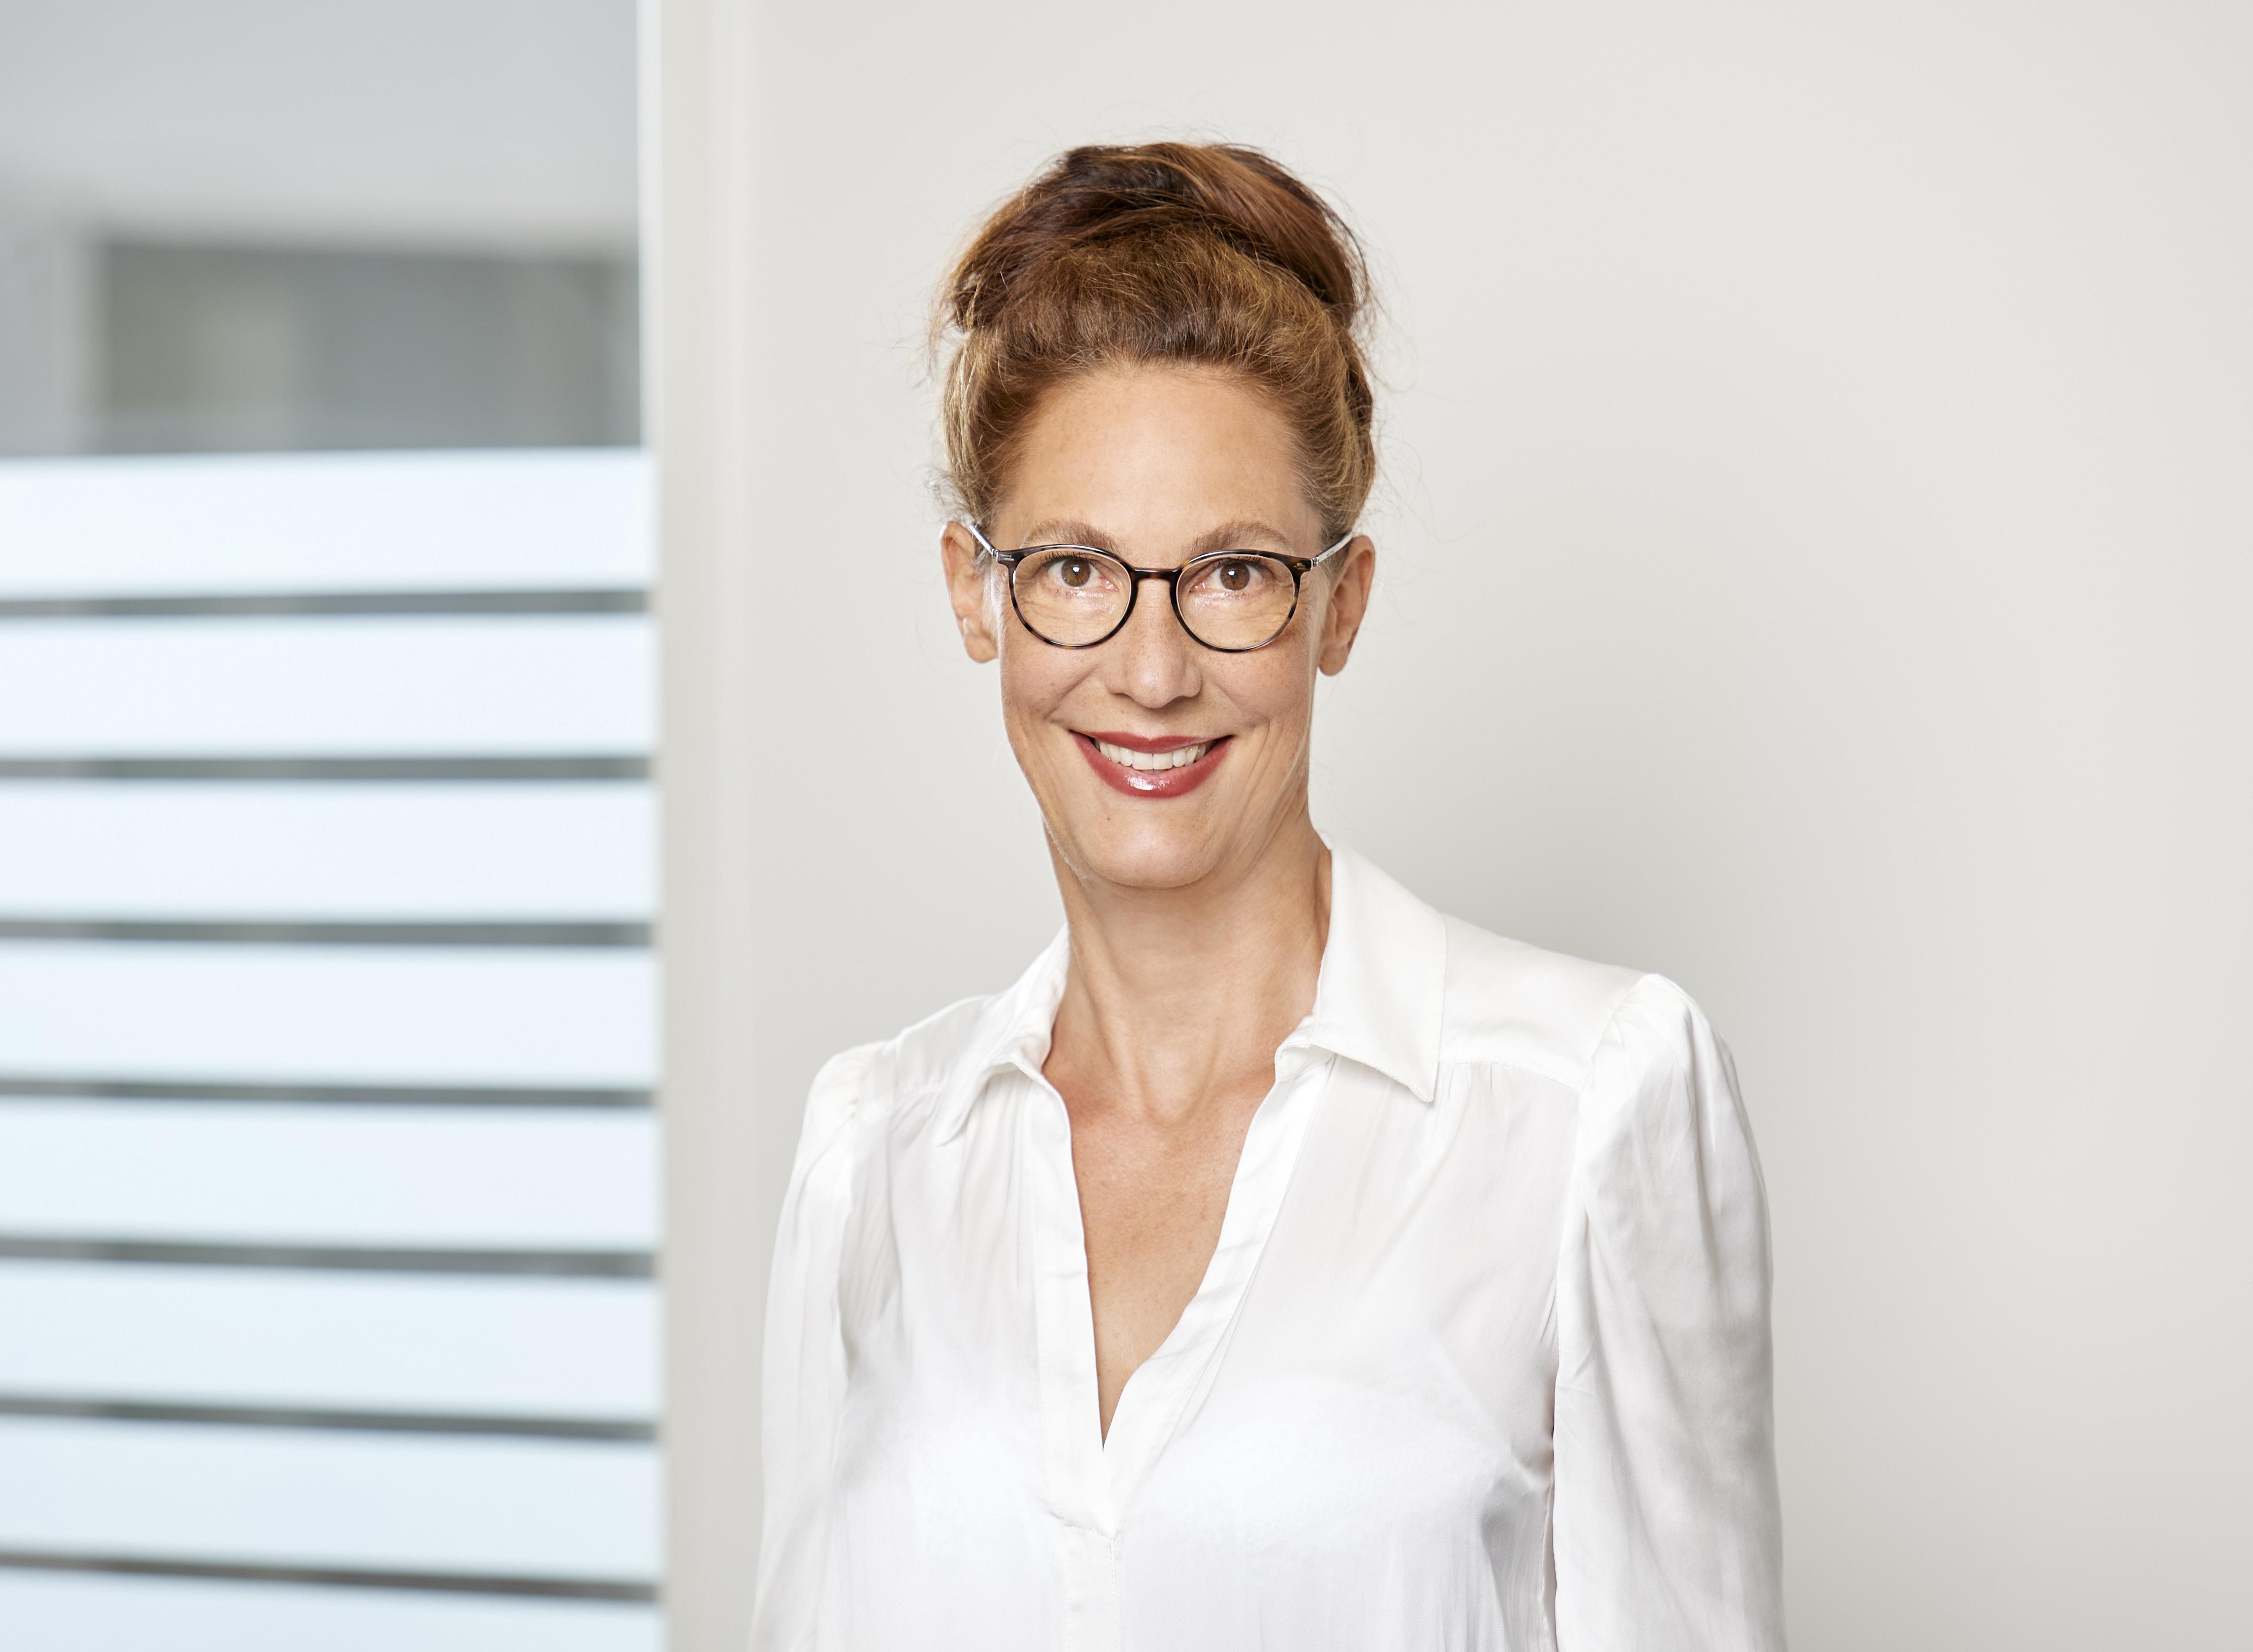 JuliaKahlenberg